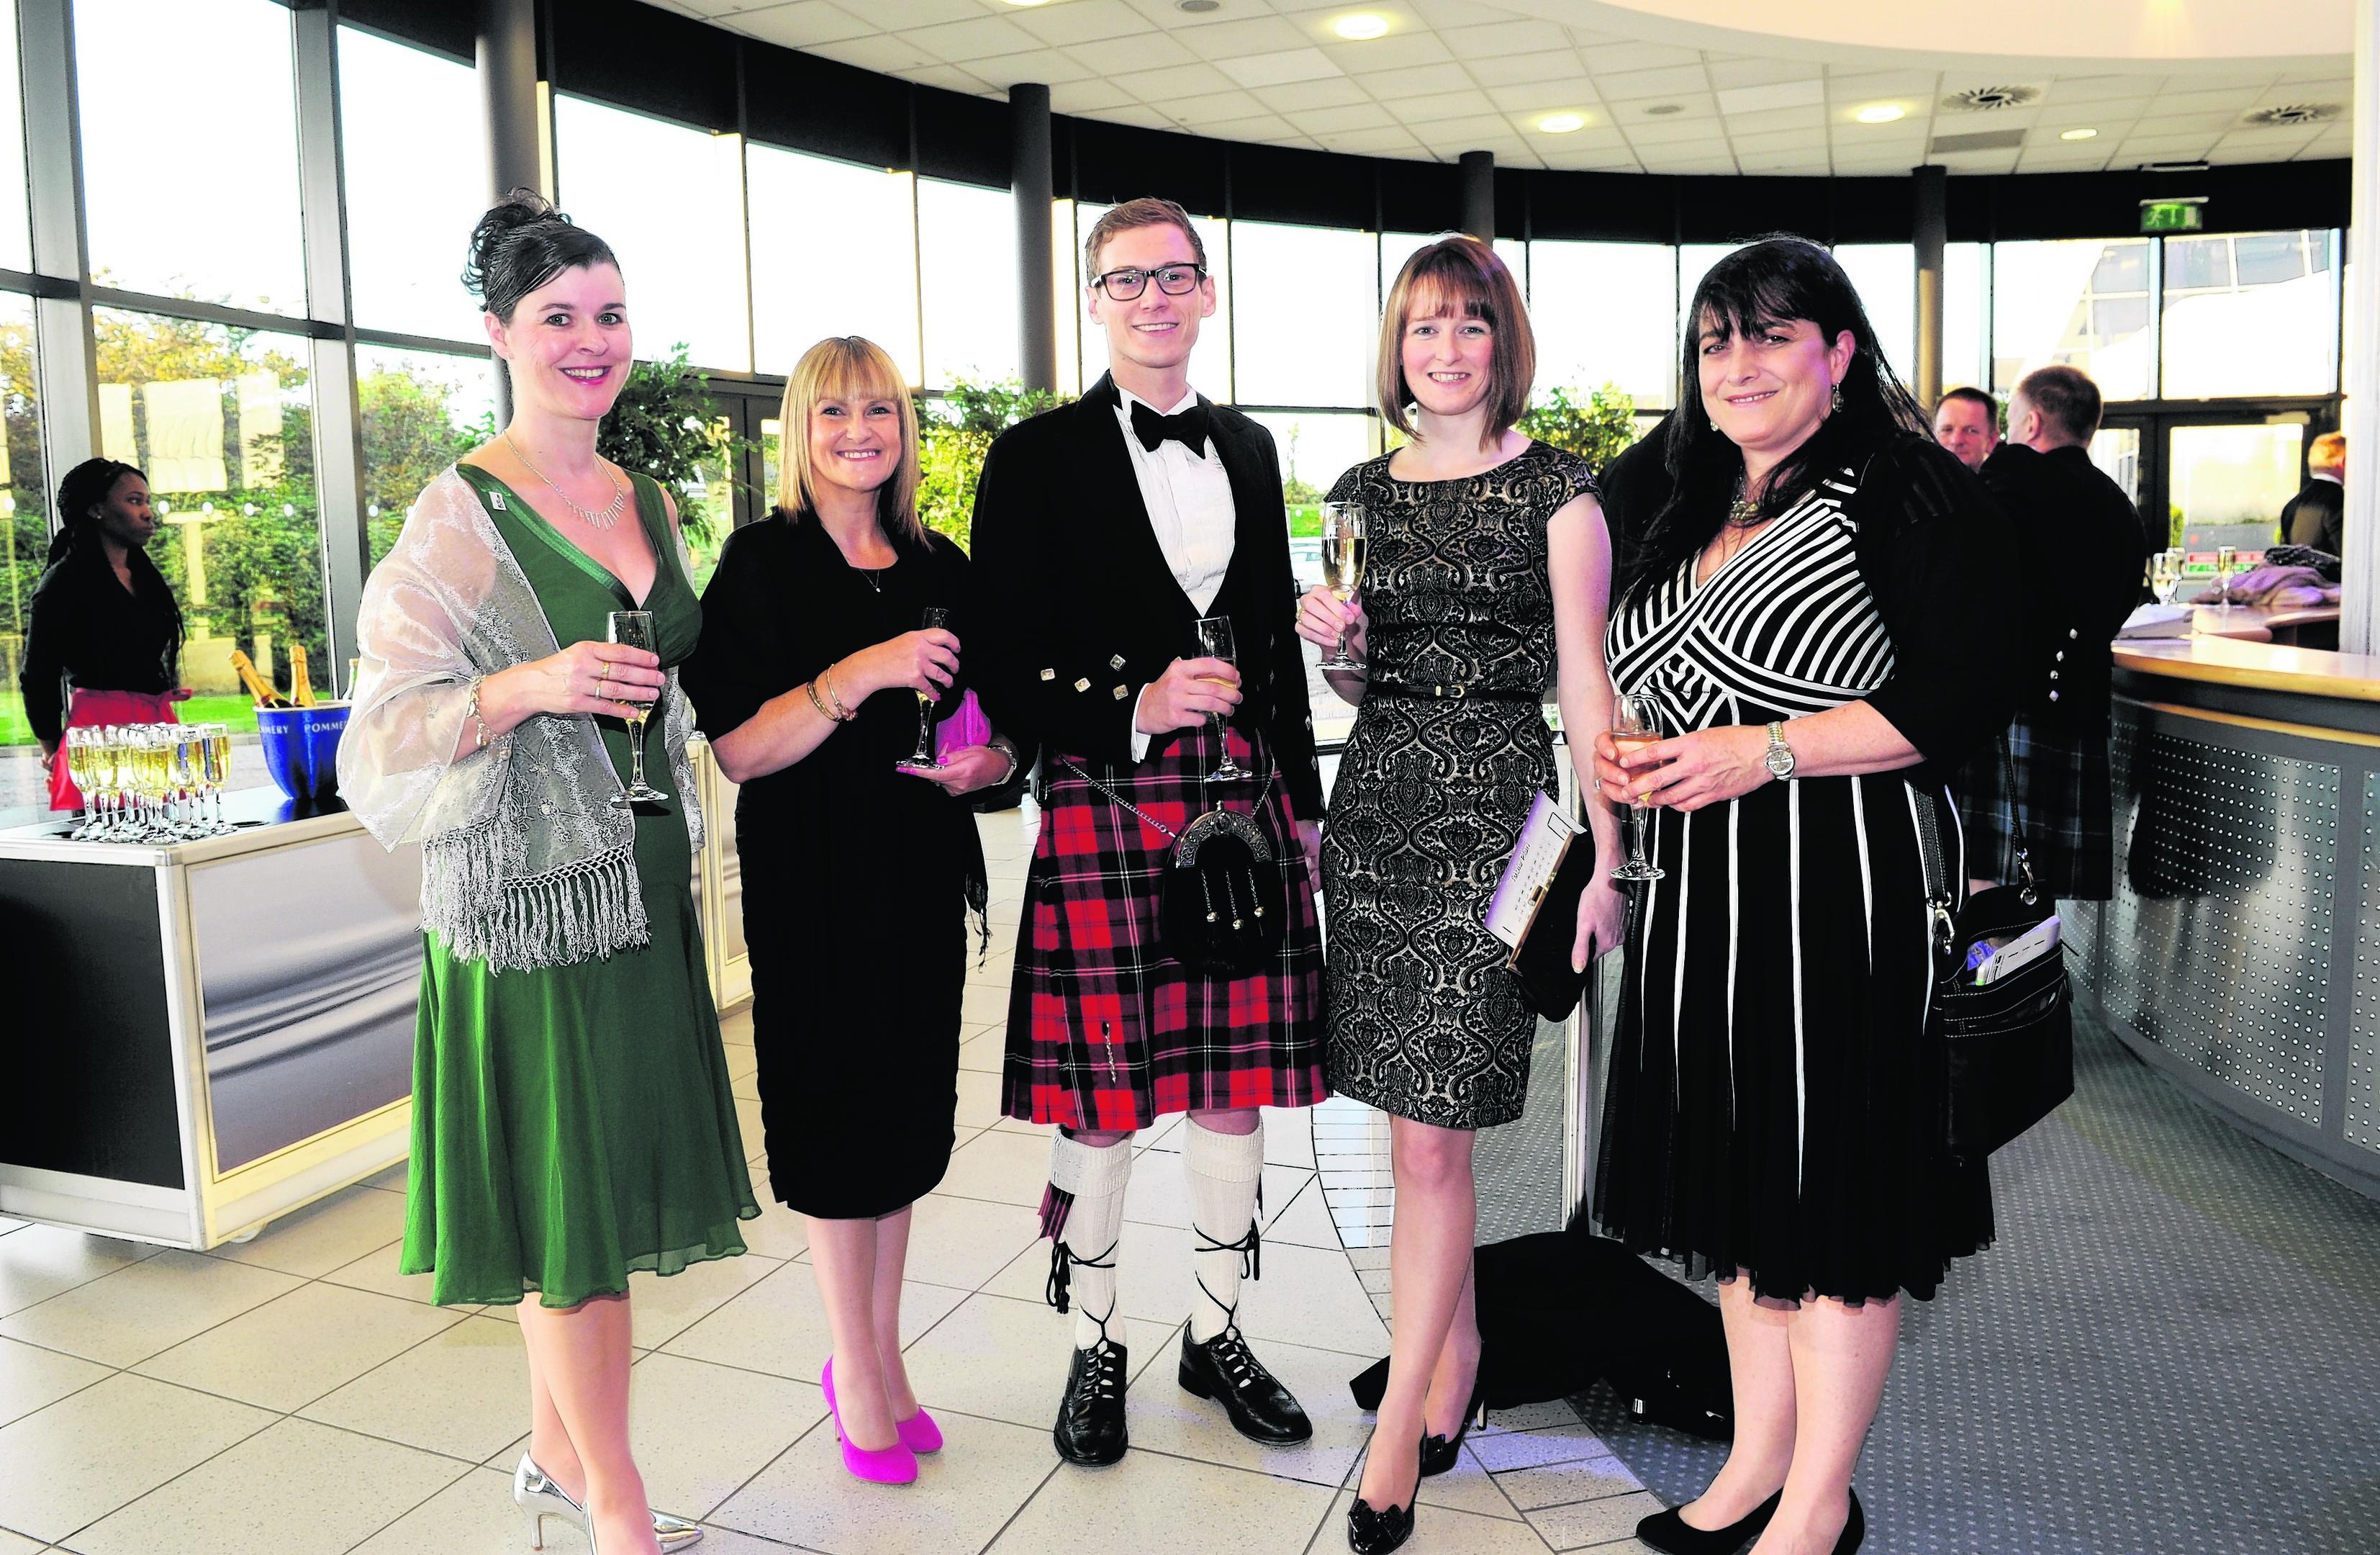 Aileen Stewart, Jackie Spence, Euan Grossett, Jennifer Mitchell and Isla Dewar attending the Northern Star Business Awards at AECC.